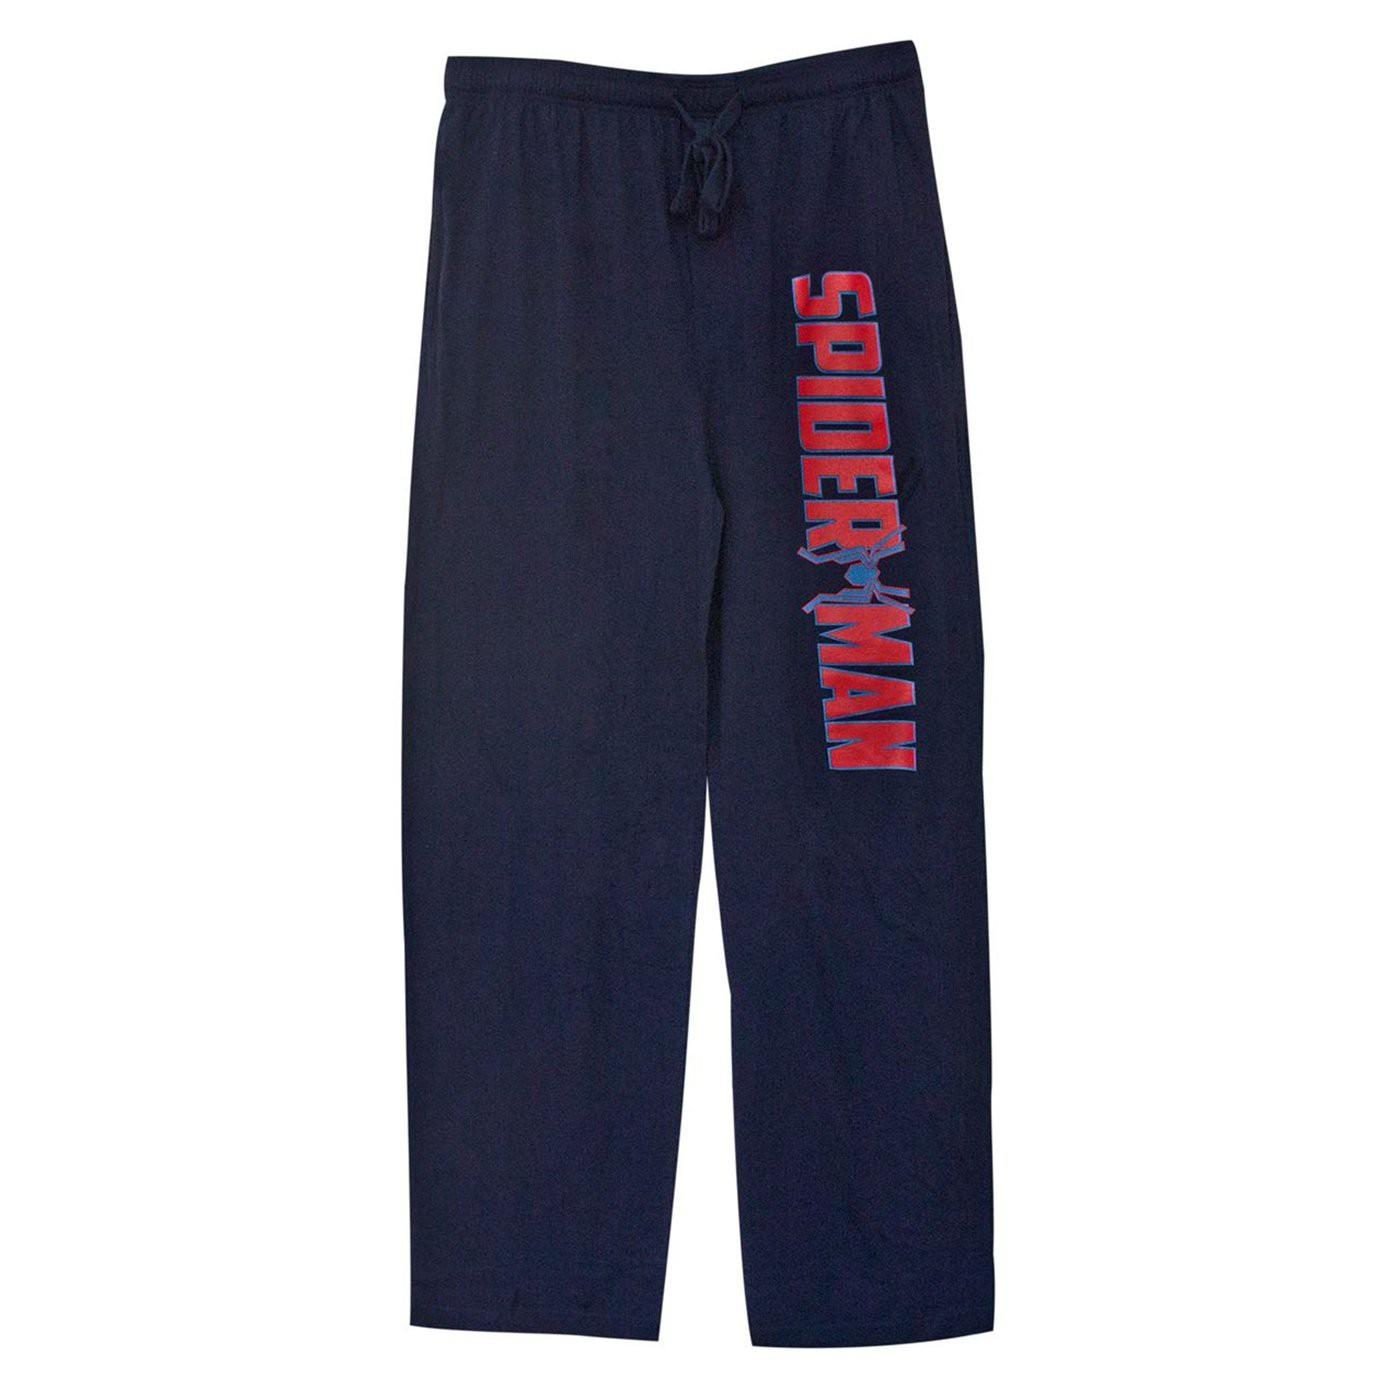 Spider-Man Iron Spider Logo Navy Unisex Sleep Pants